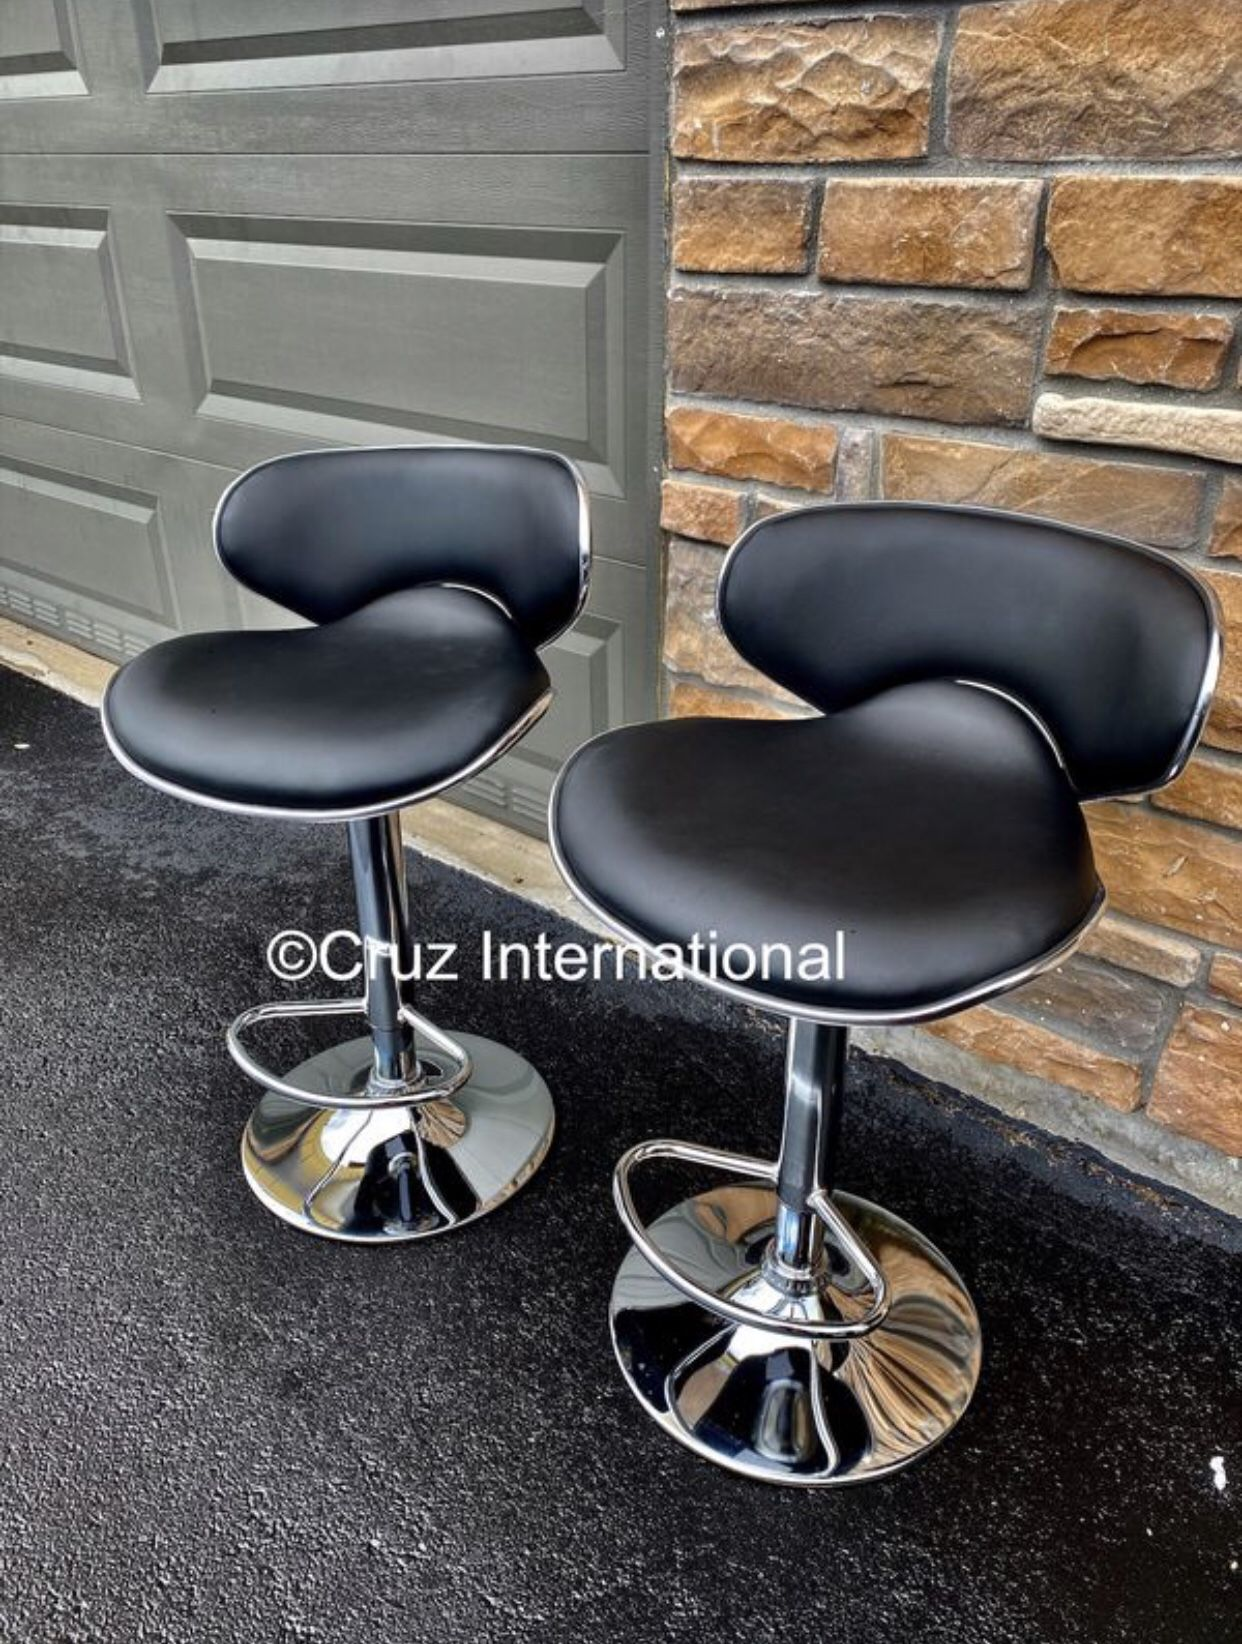 New 2 black stools